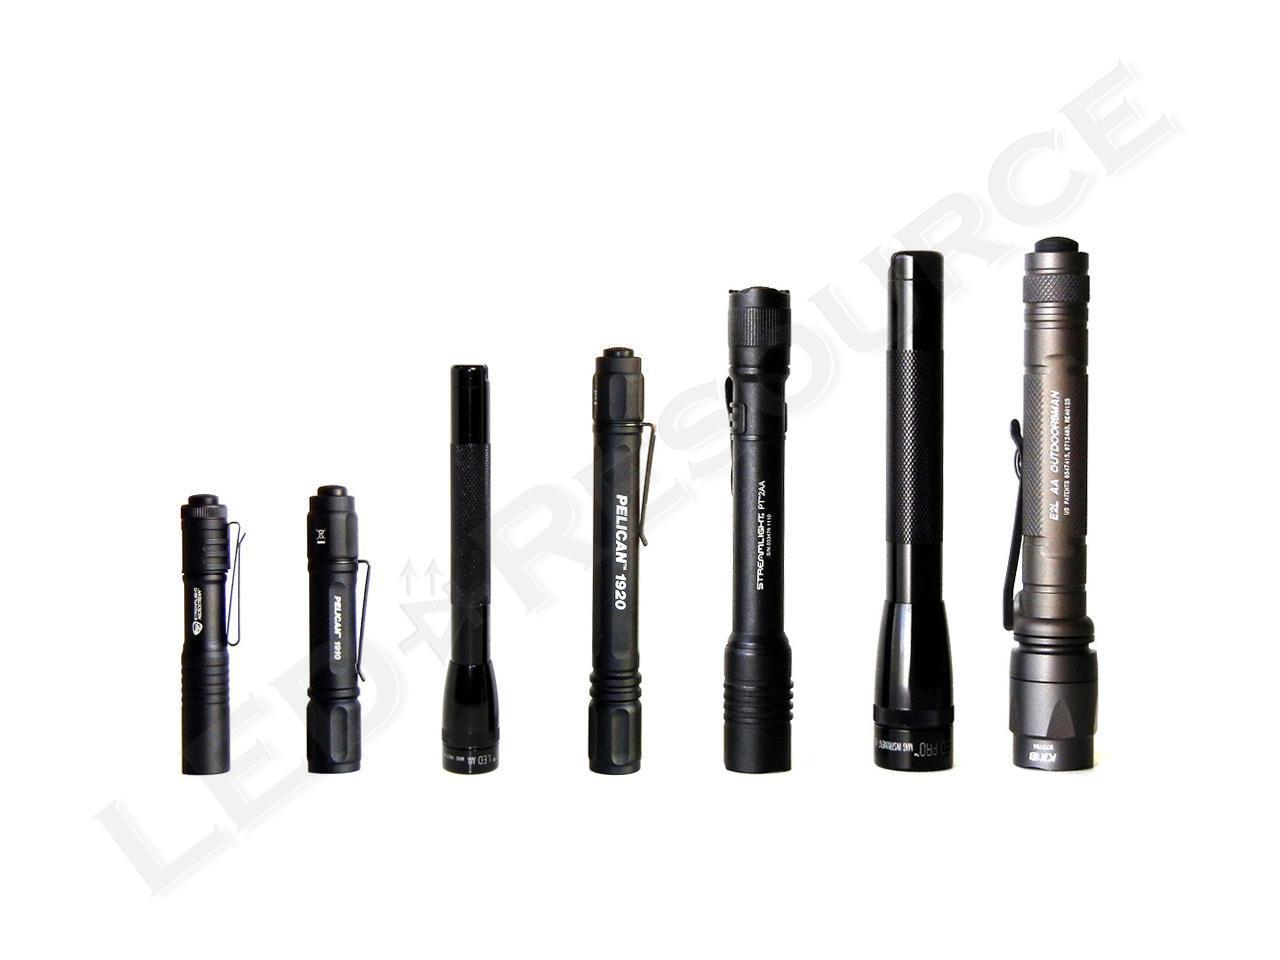 Mini Maglite 2aaa Led Flashlight Review